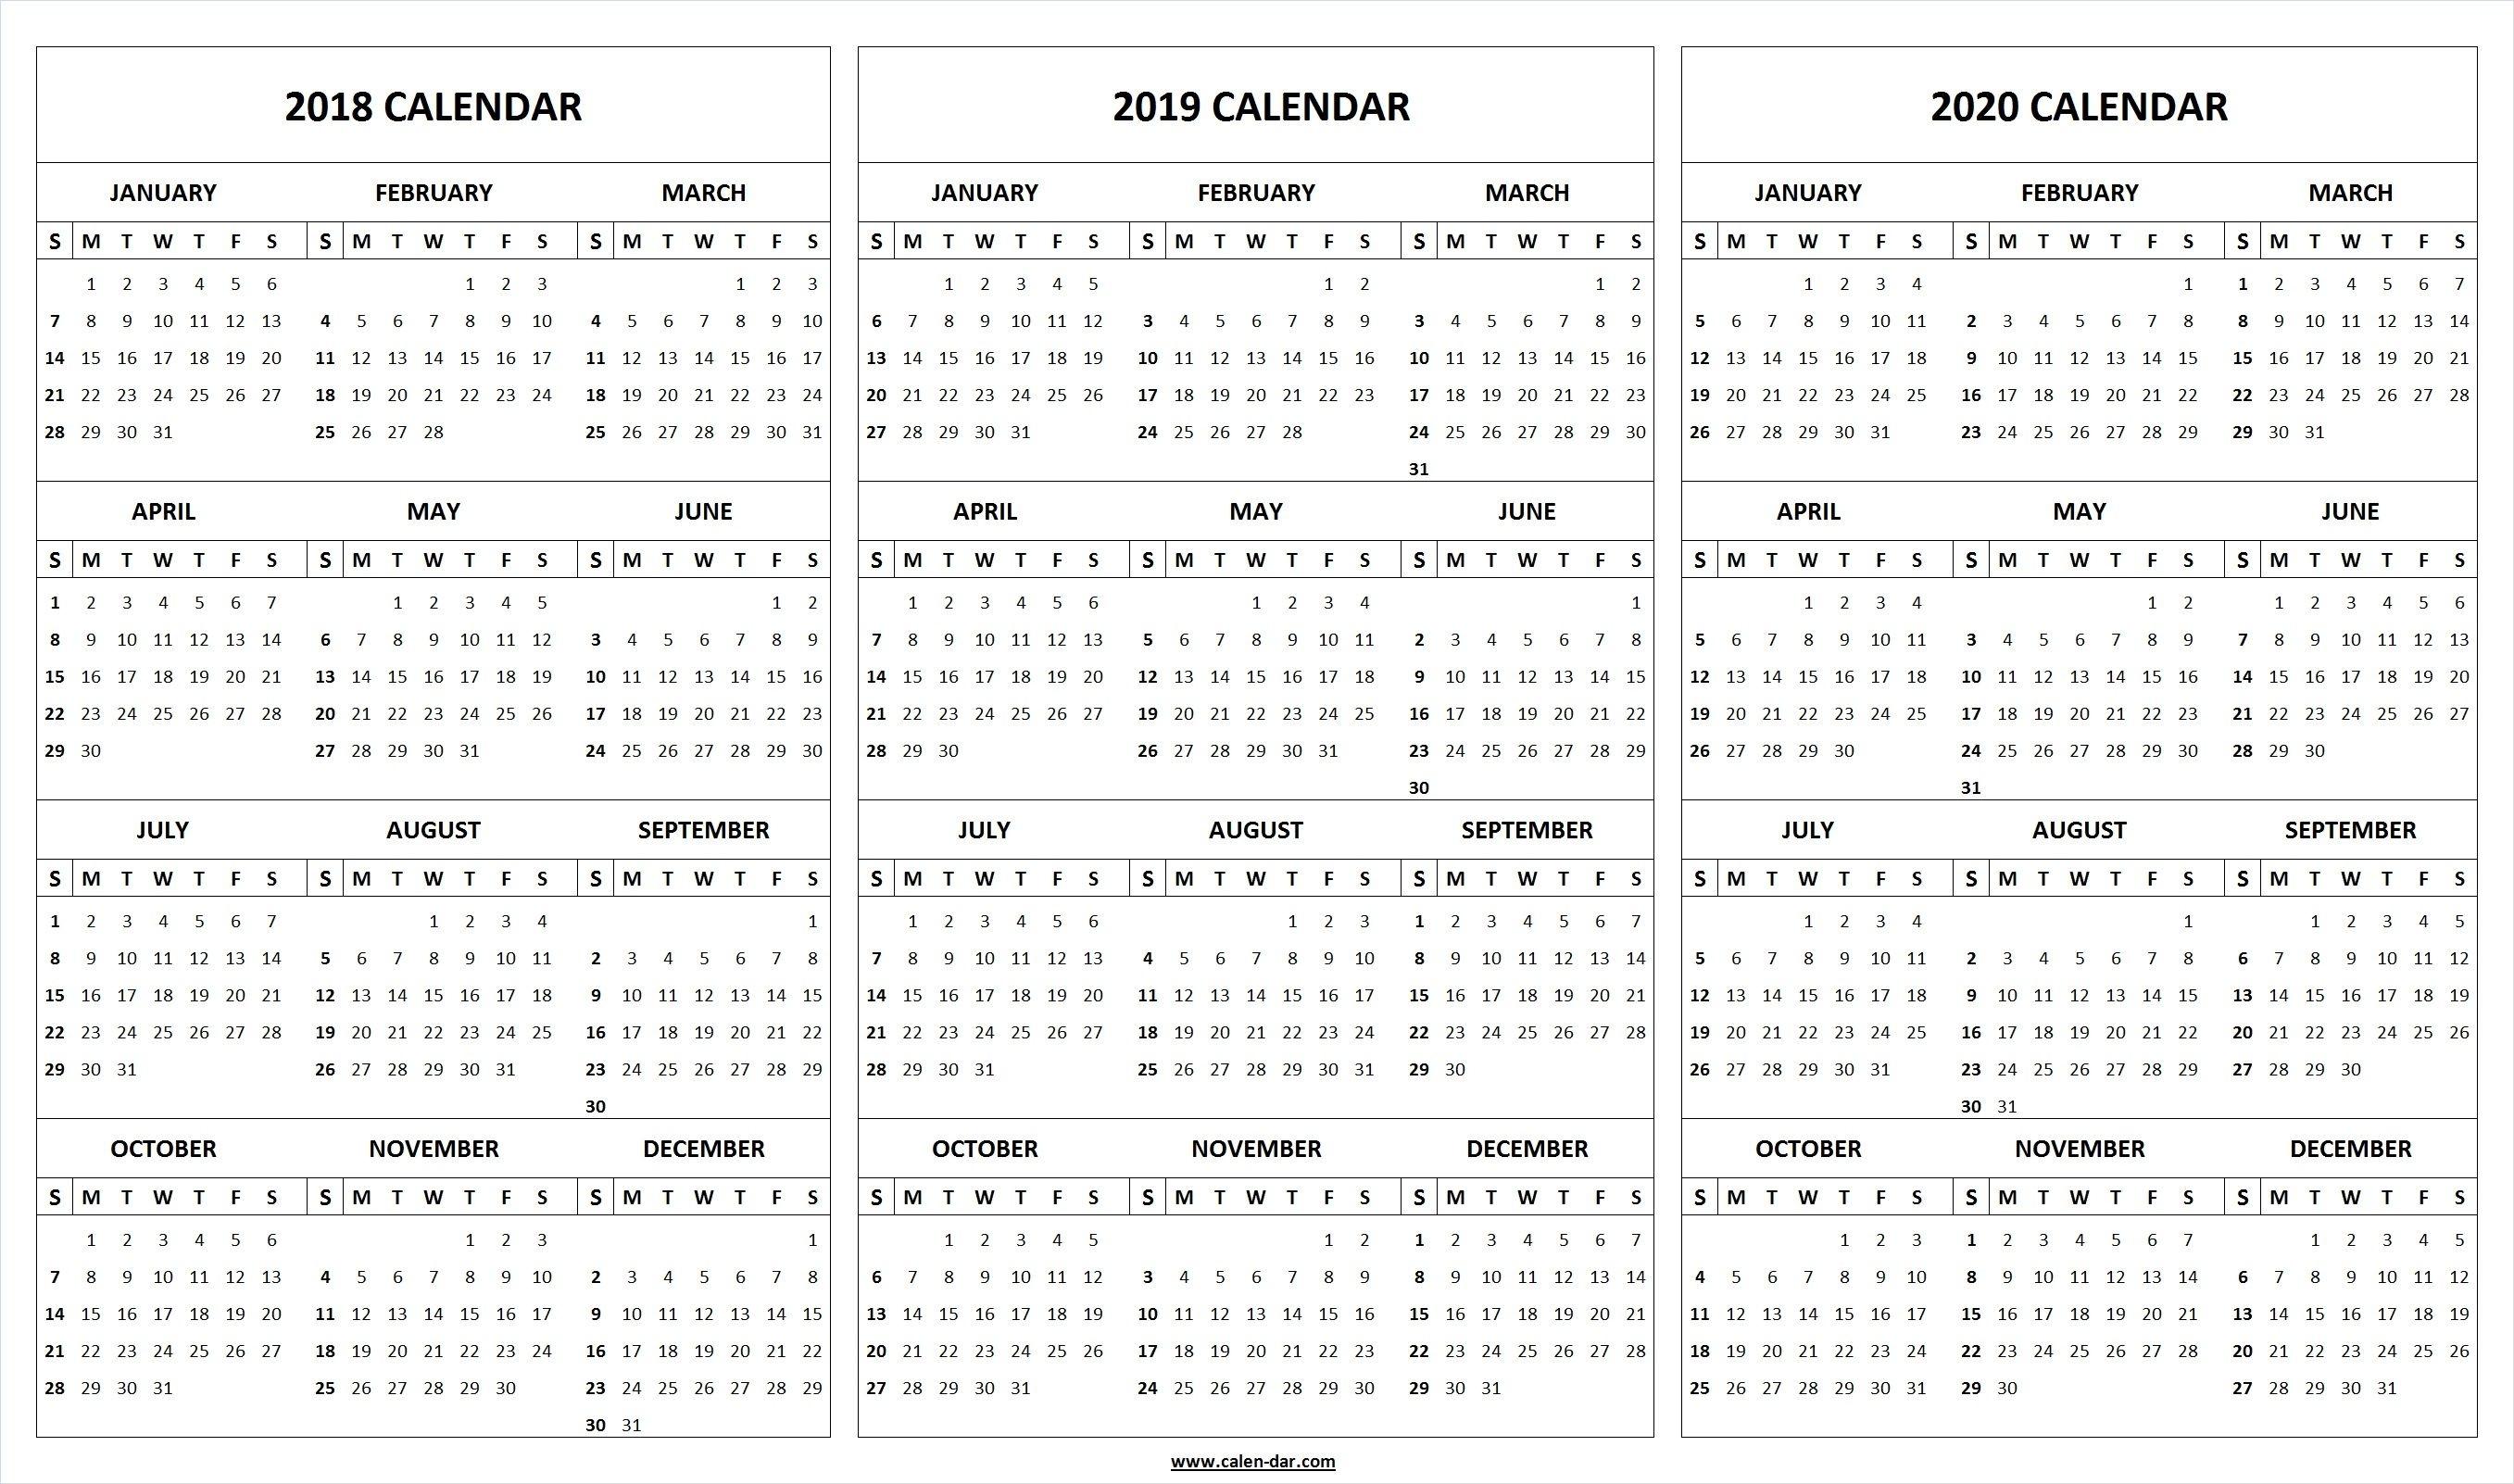 Print Blank 2018 2019 2020 Calendar Template | Organize! | Printable intended for 3 Year Calendar Printable 2018 2019 2020